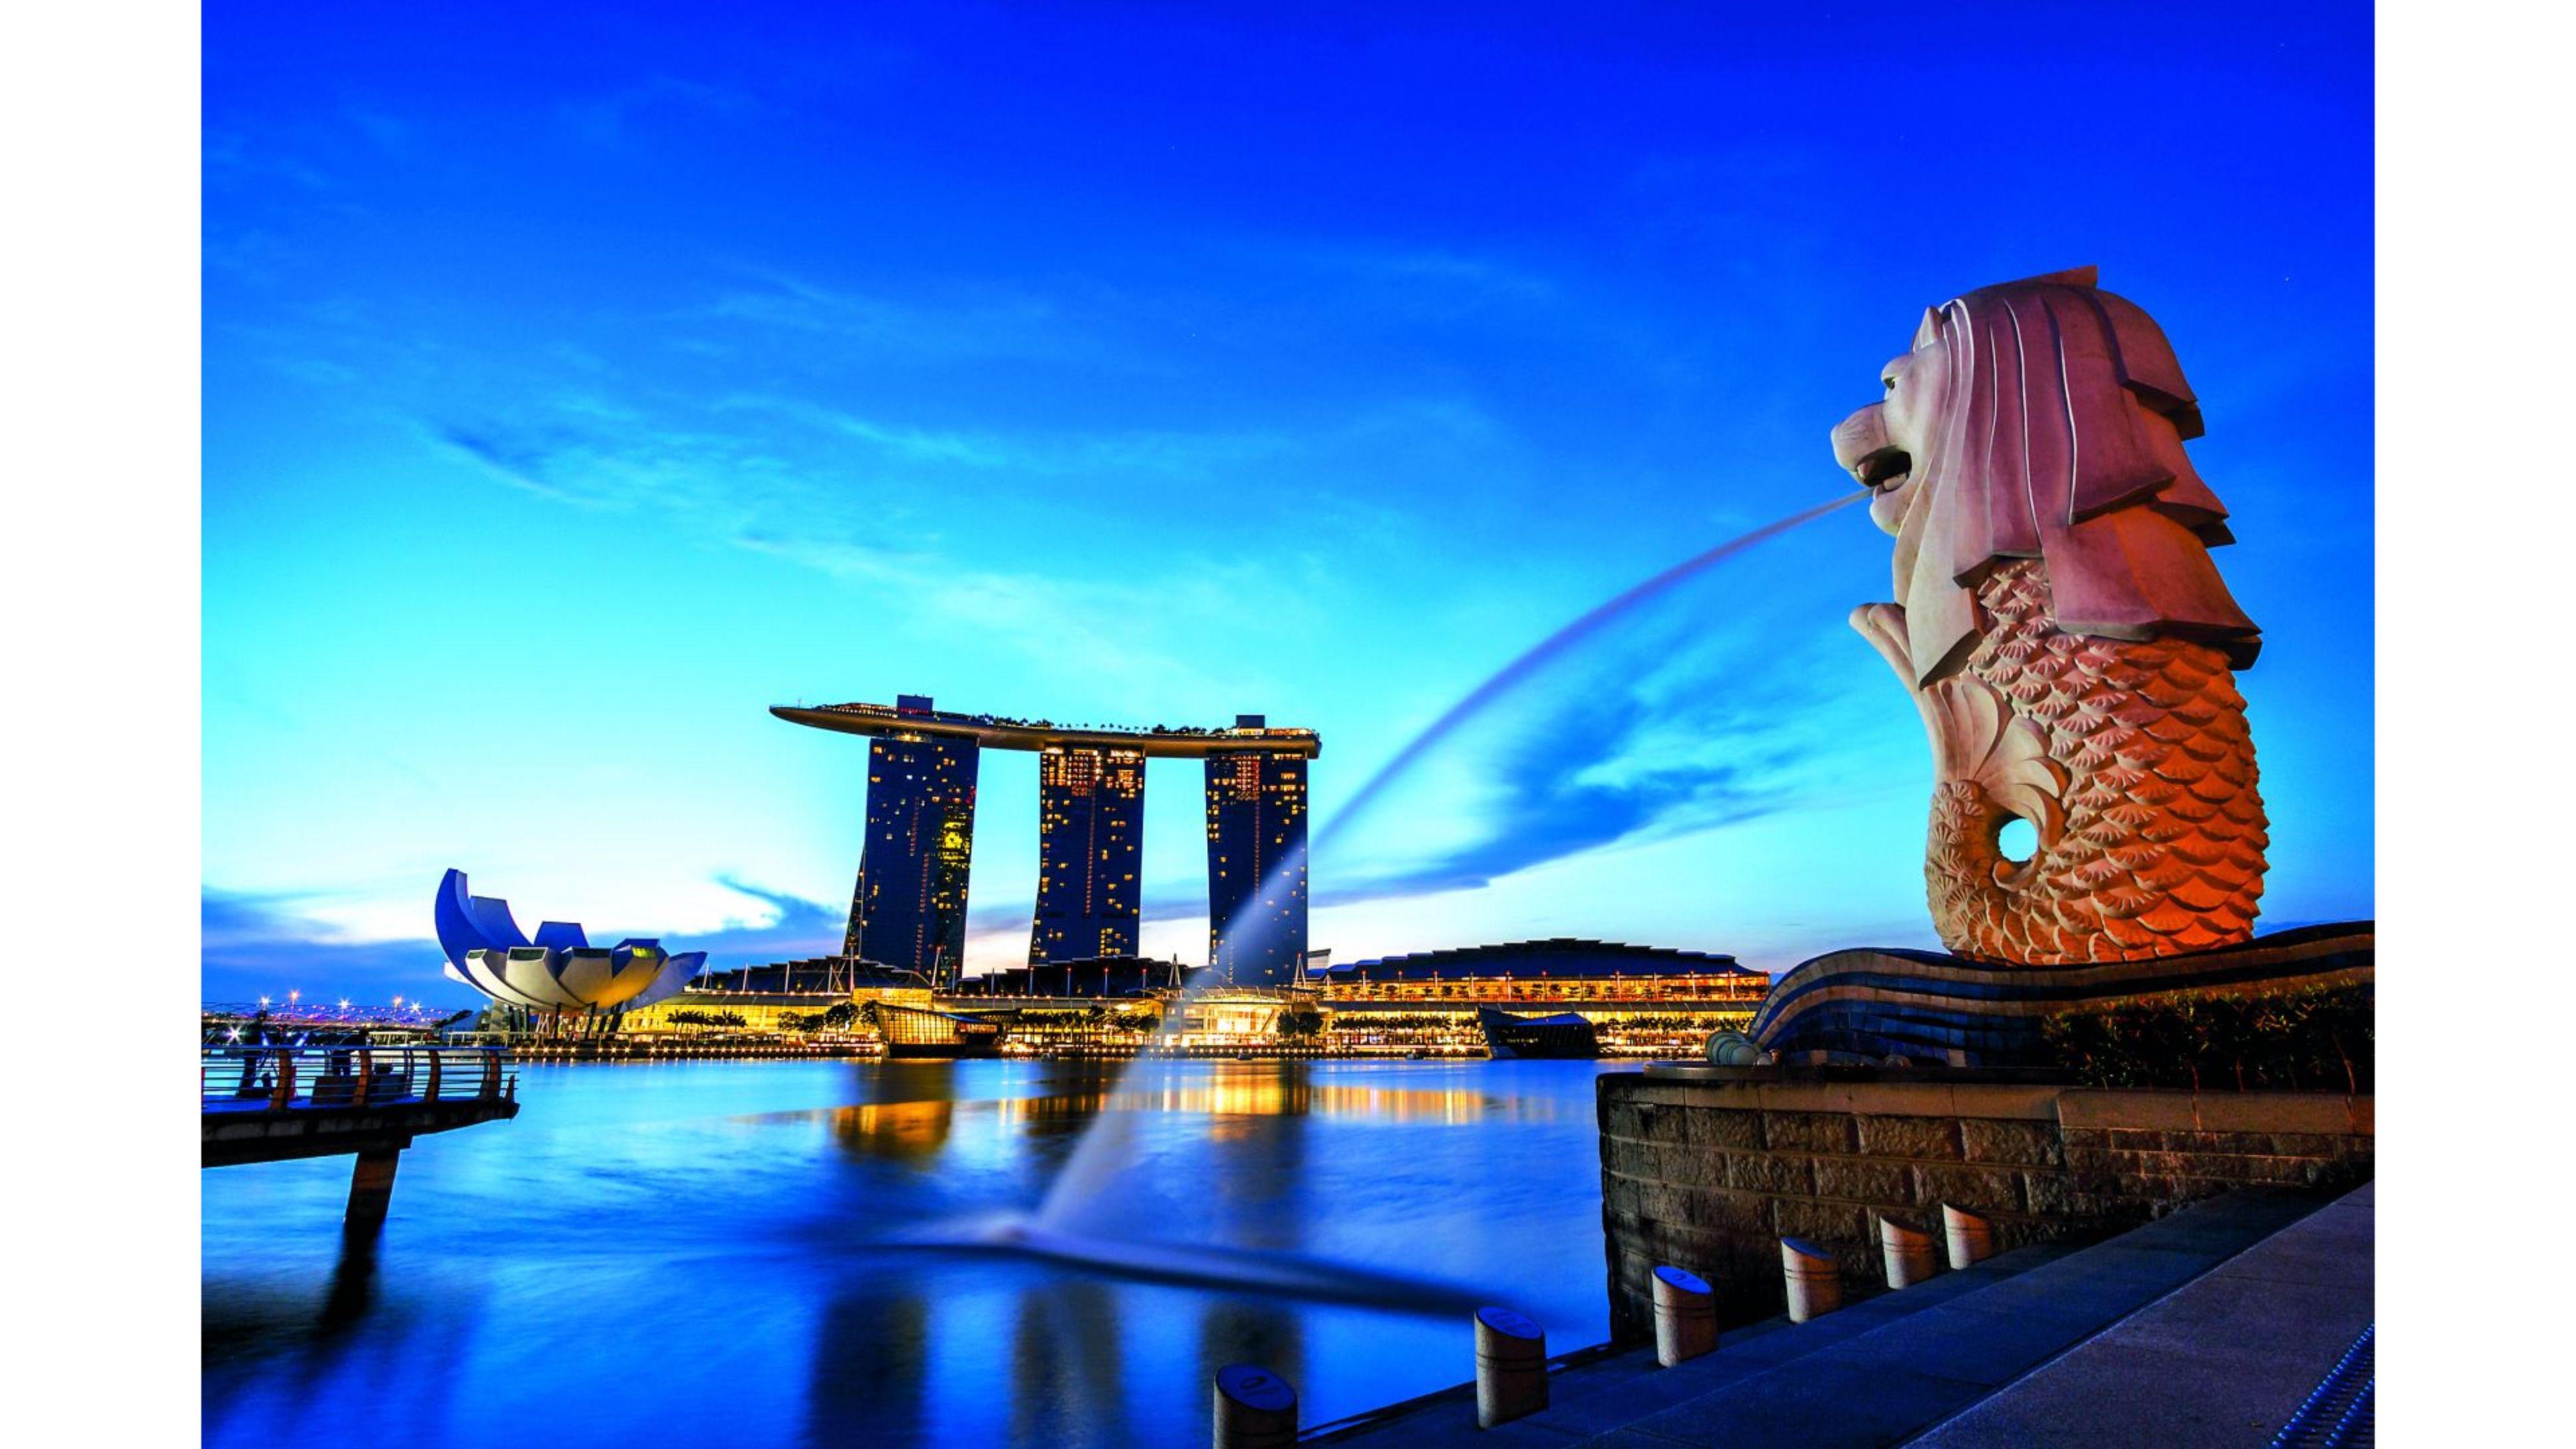 New 2016 Singapore 4K Wallpaper 4K Wallpaper 3840x2160